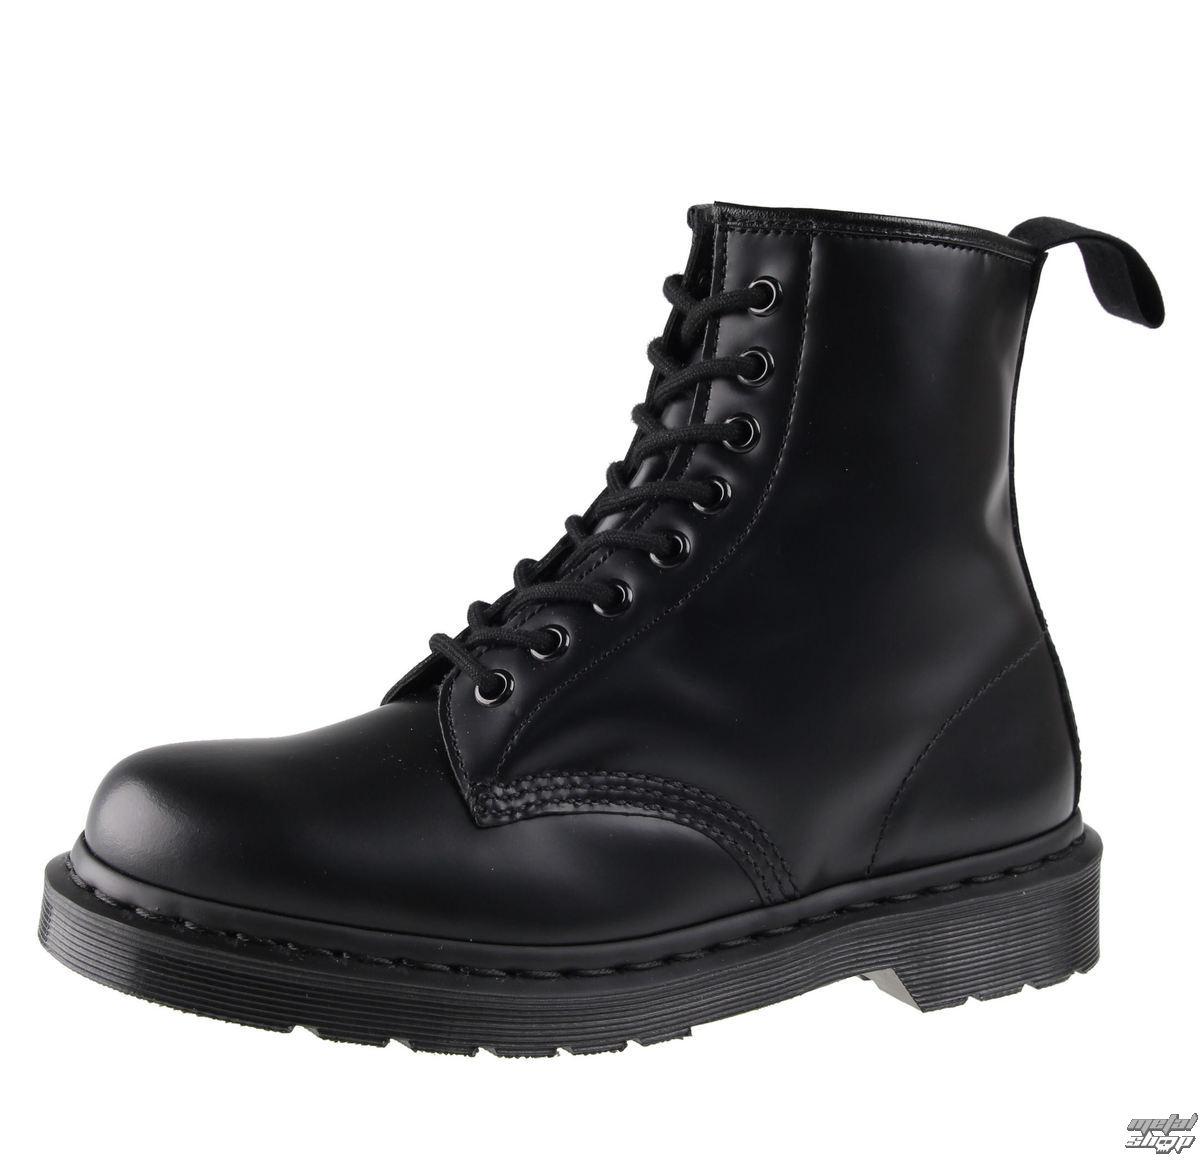 boty Dr. Martens 8 dírkové - DM 1460 MONO BLACK SMOOTH - DM14353001